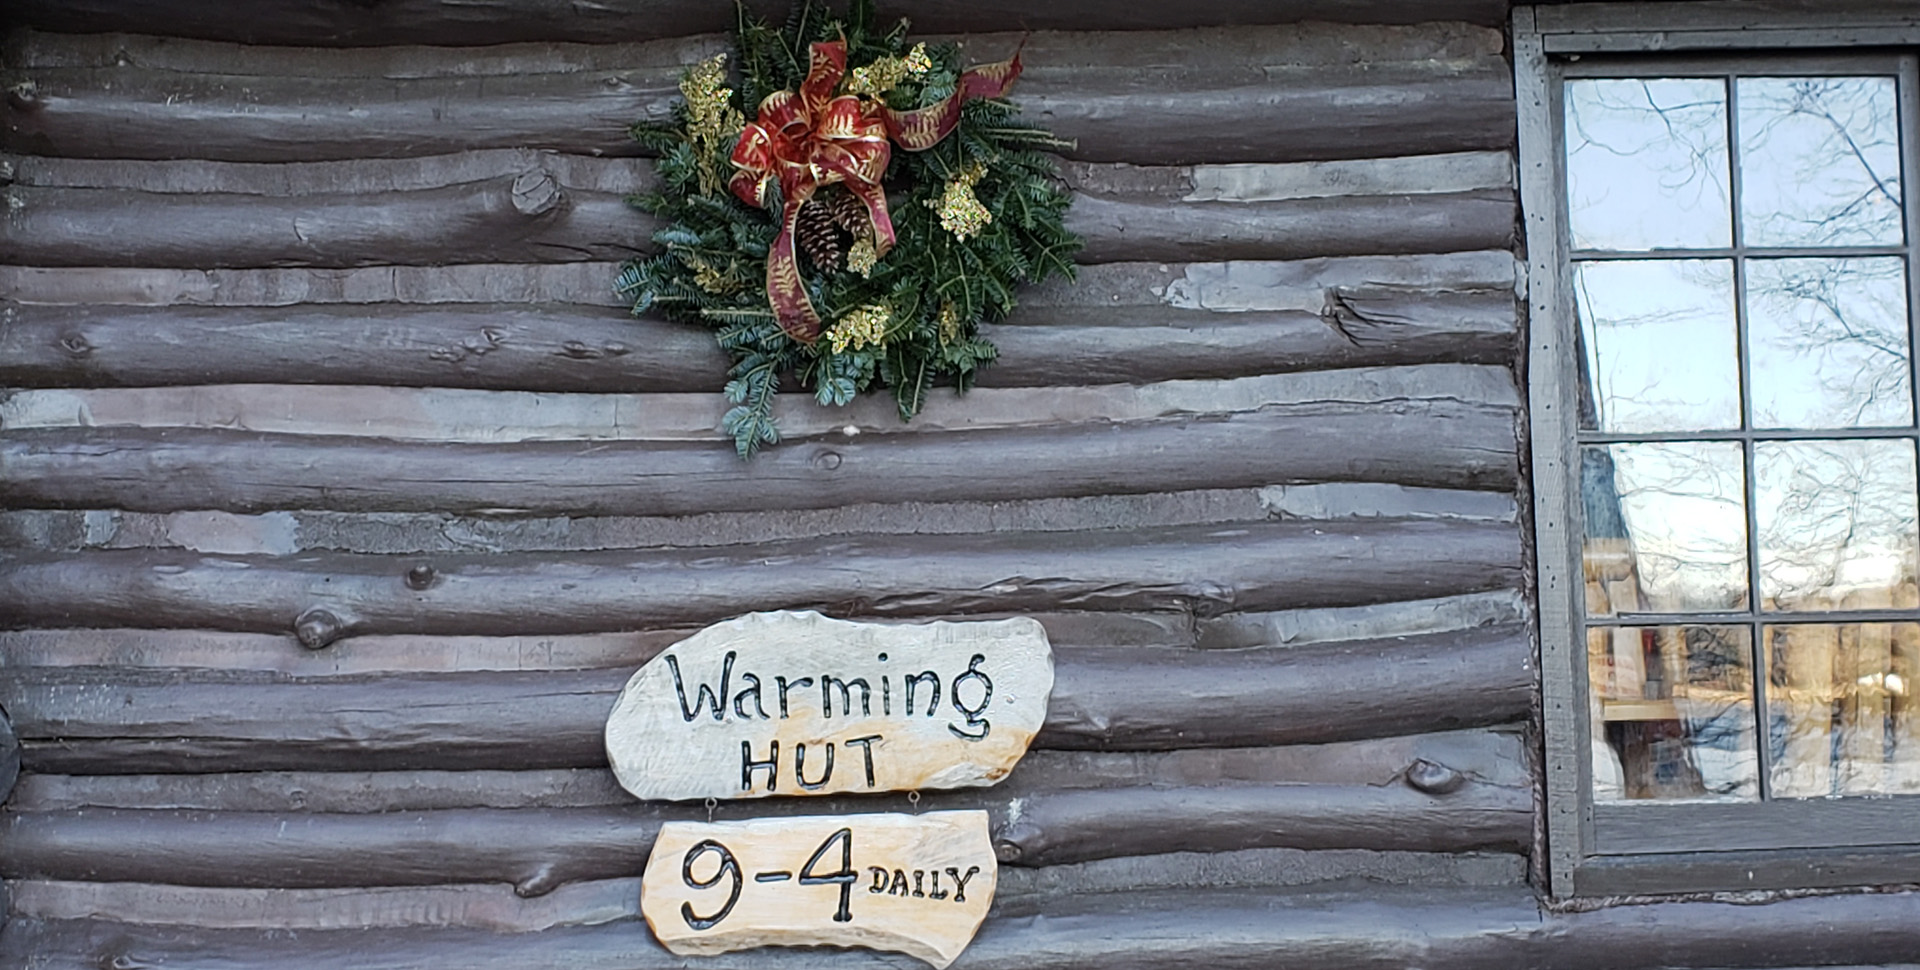 Warming Hut Open